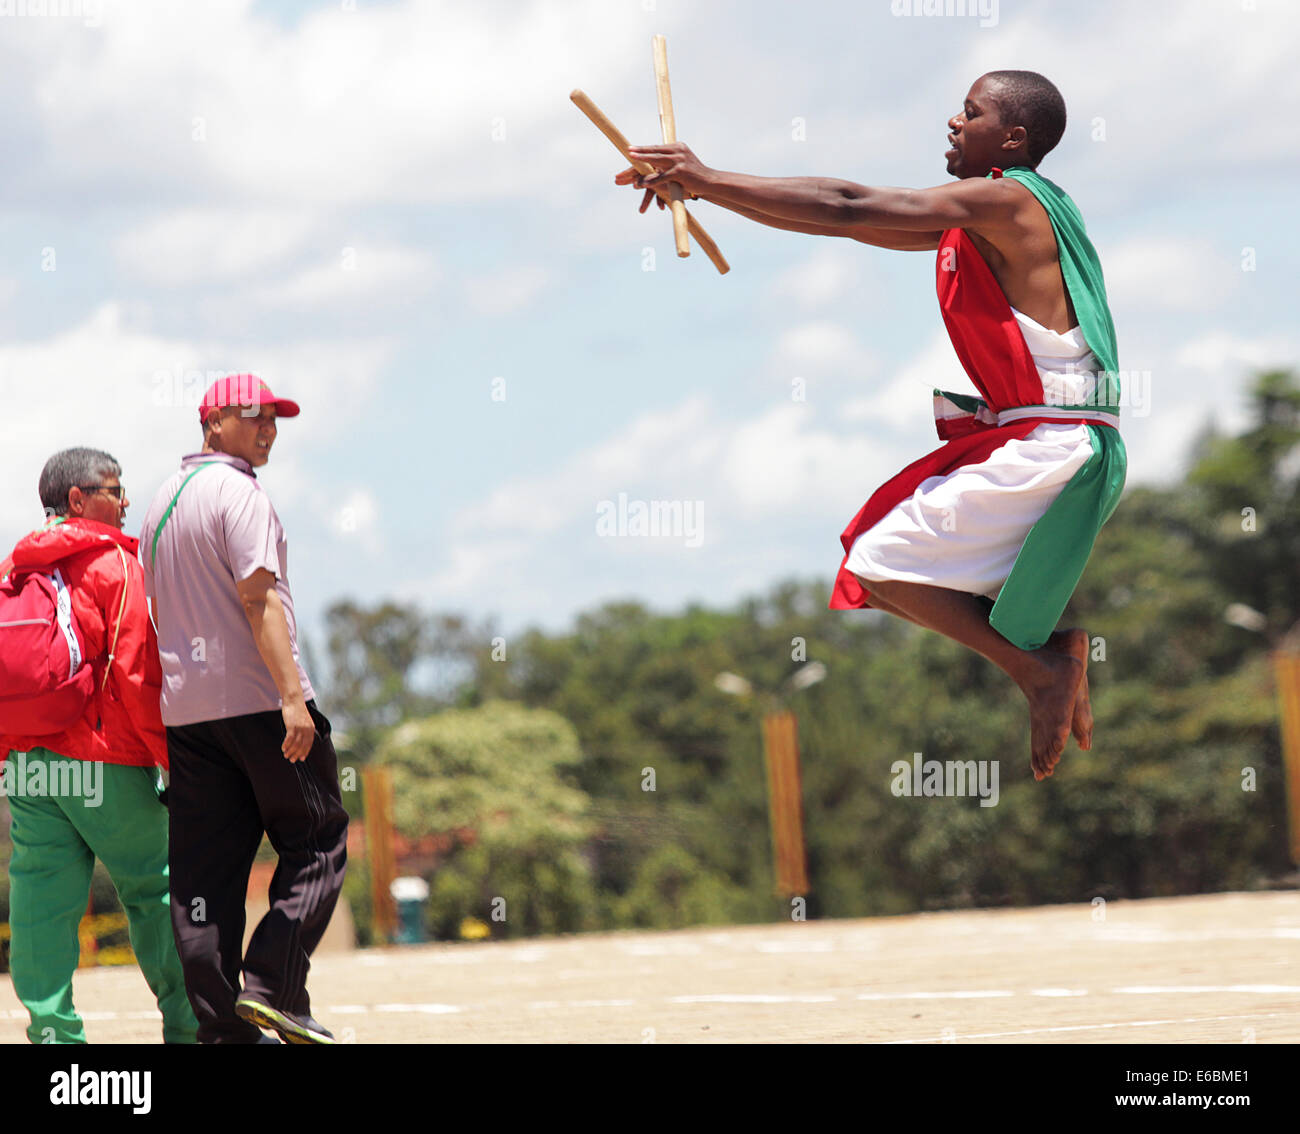 A member of a Burundi cultural dance troupe entertains guests in Kampala, Uganda - Stock Image